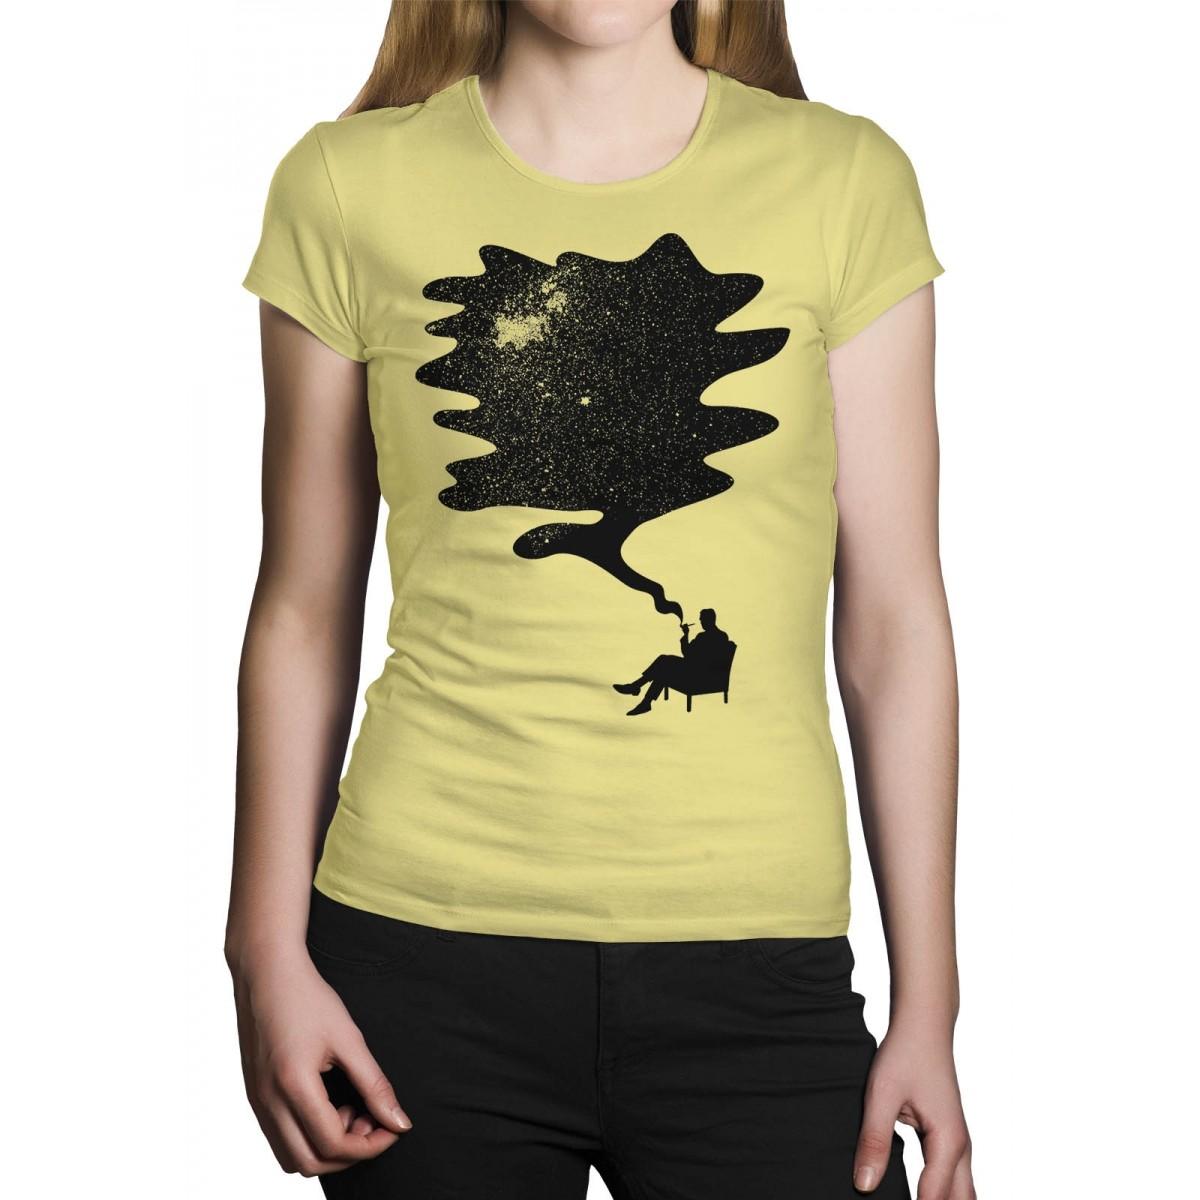 Camiseta HShop Space Pipe  - HShop